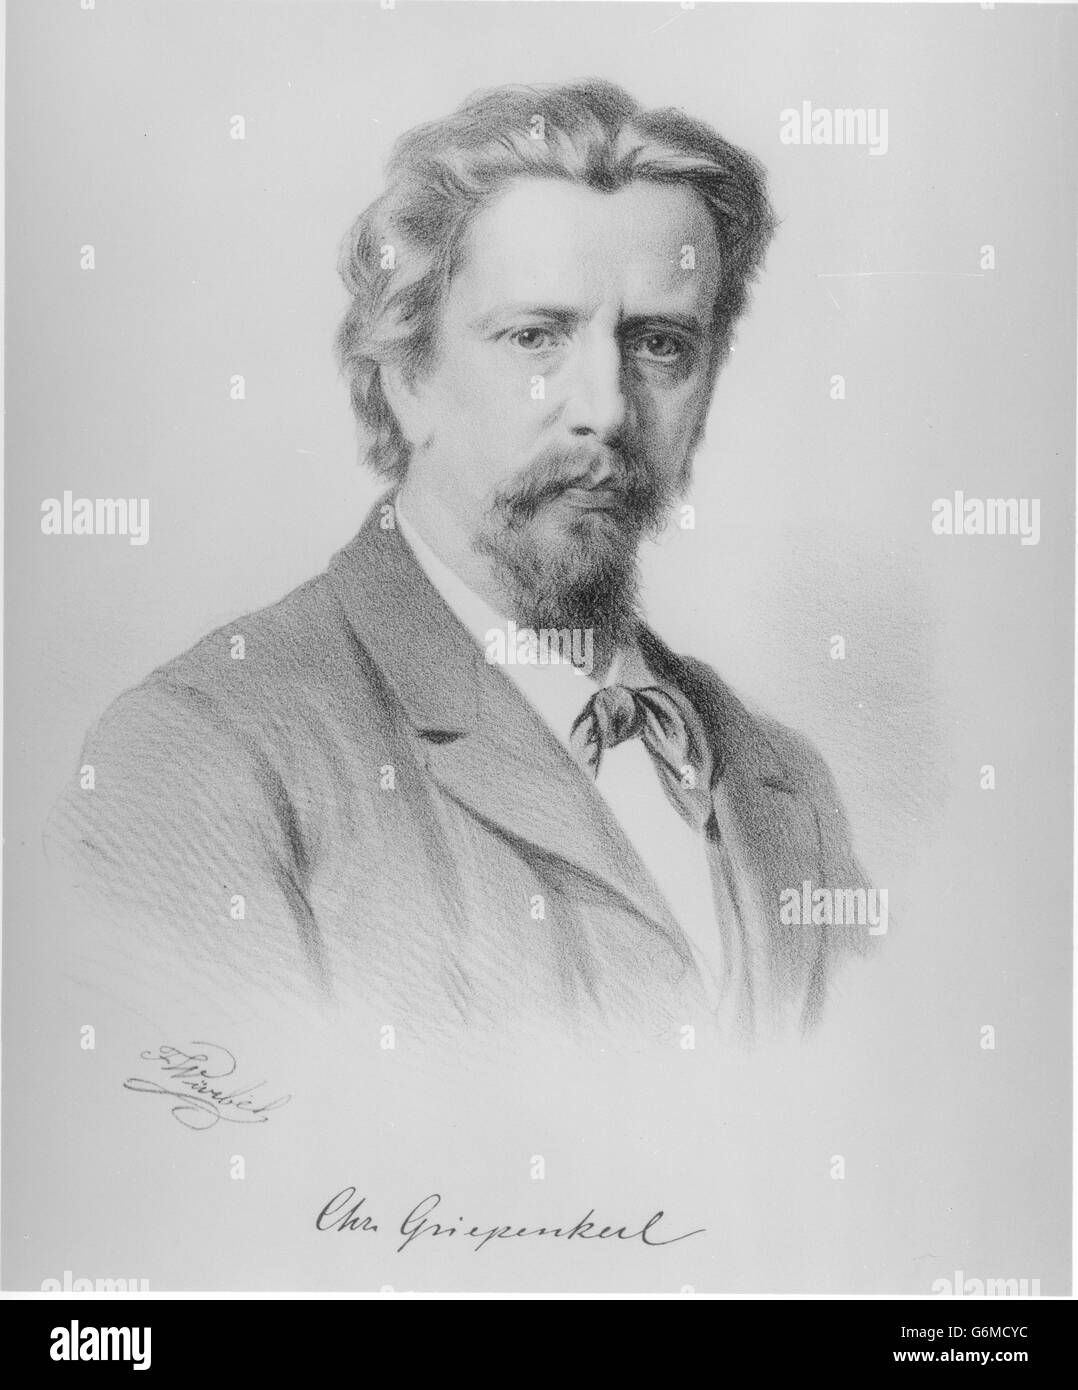 Bildnis Christian Griepenkerl Photo Stock